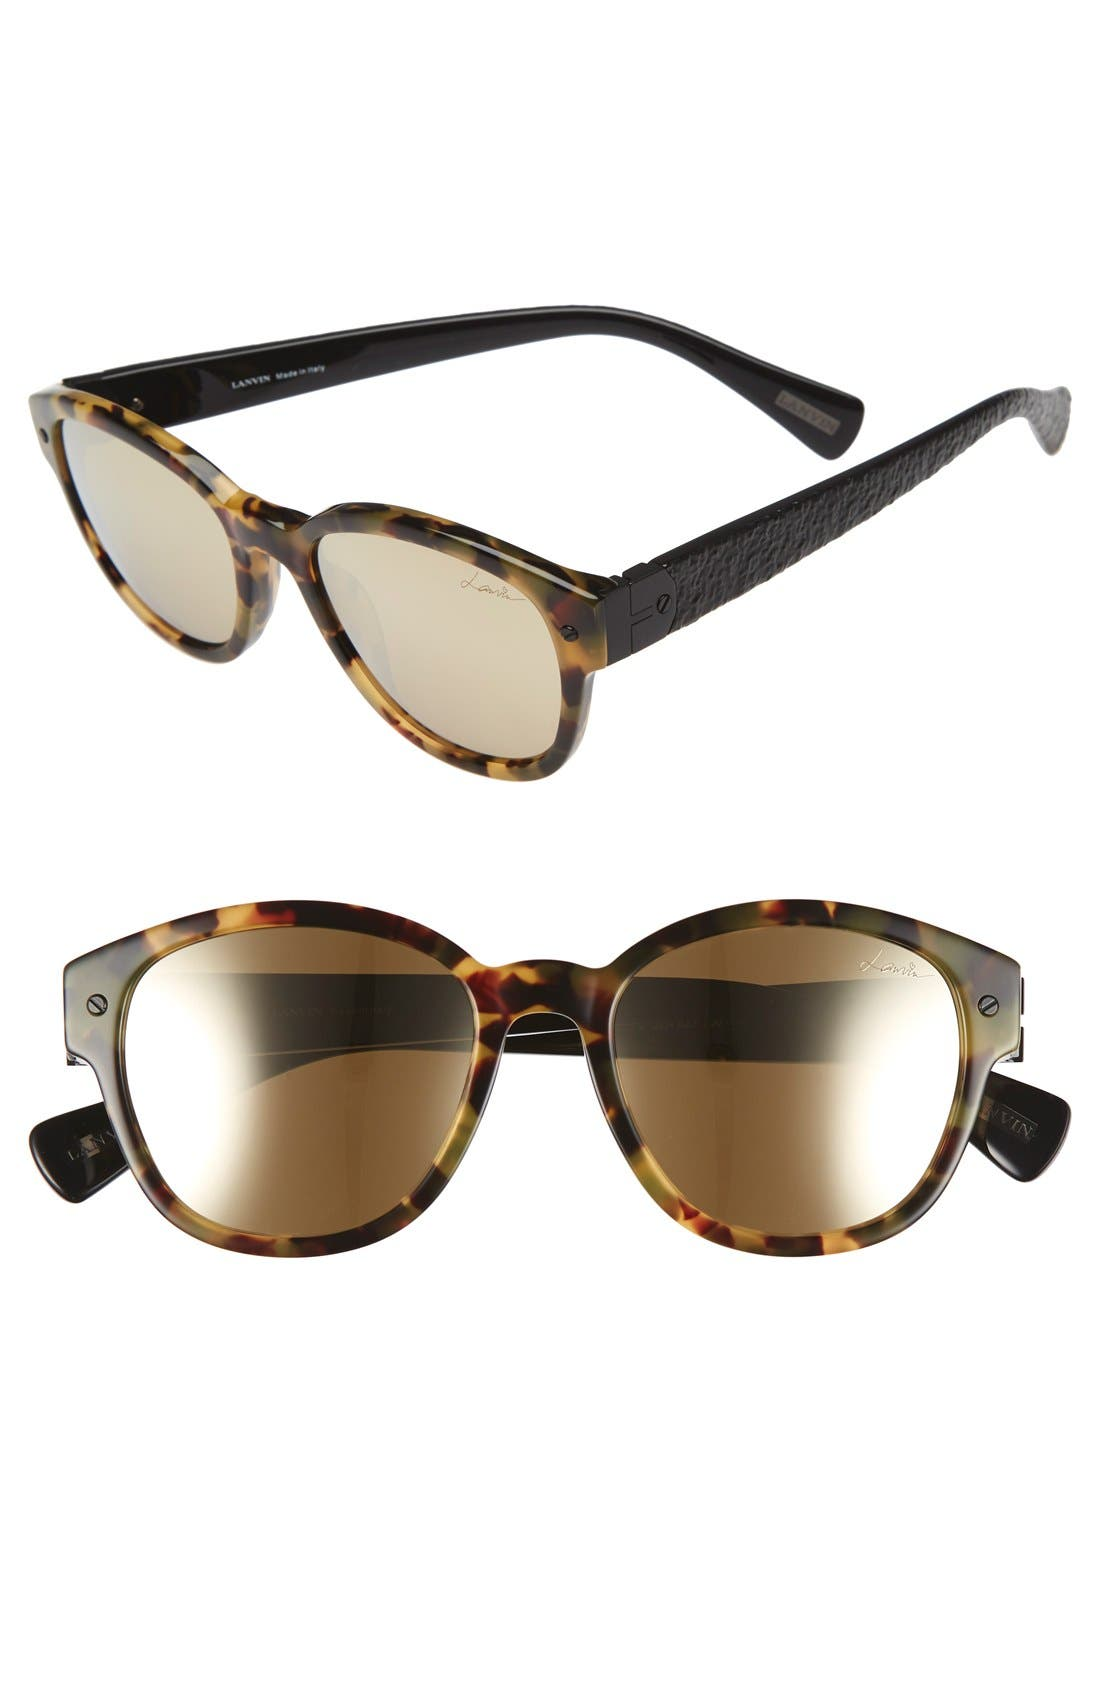 50mm Retro Sunglasses,                             Main thumbnail 1, color,                             LIGHT HAVANA